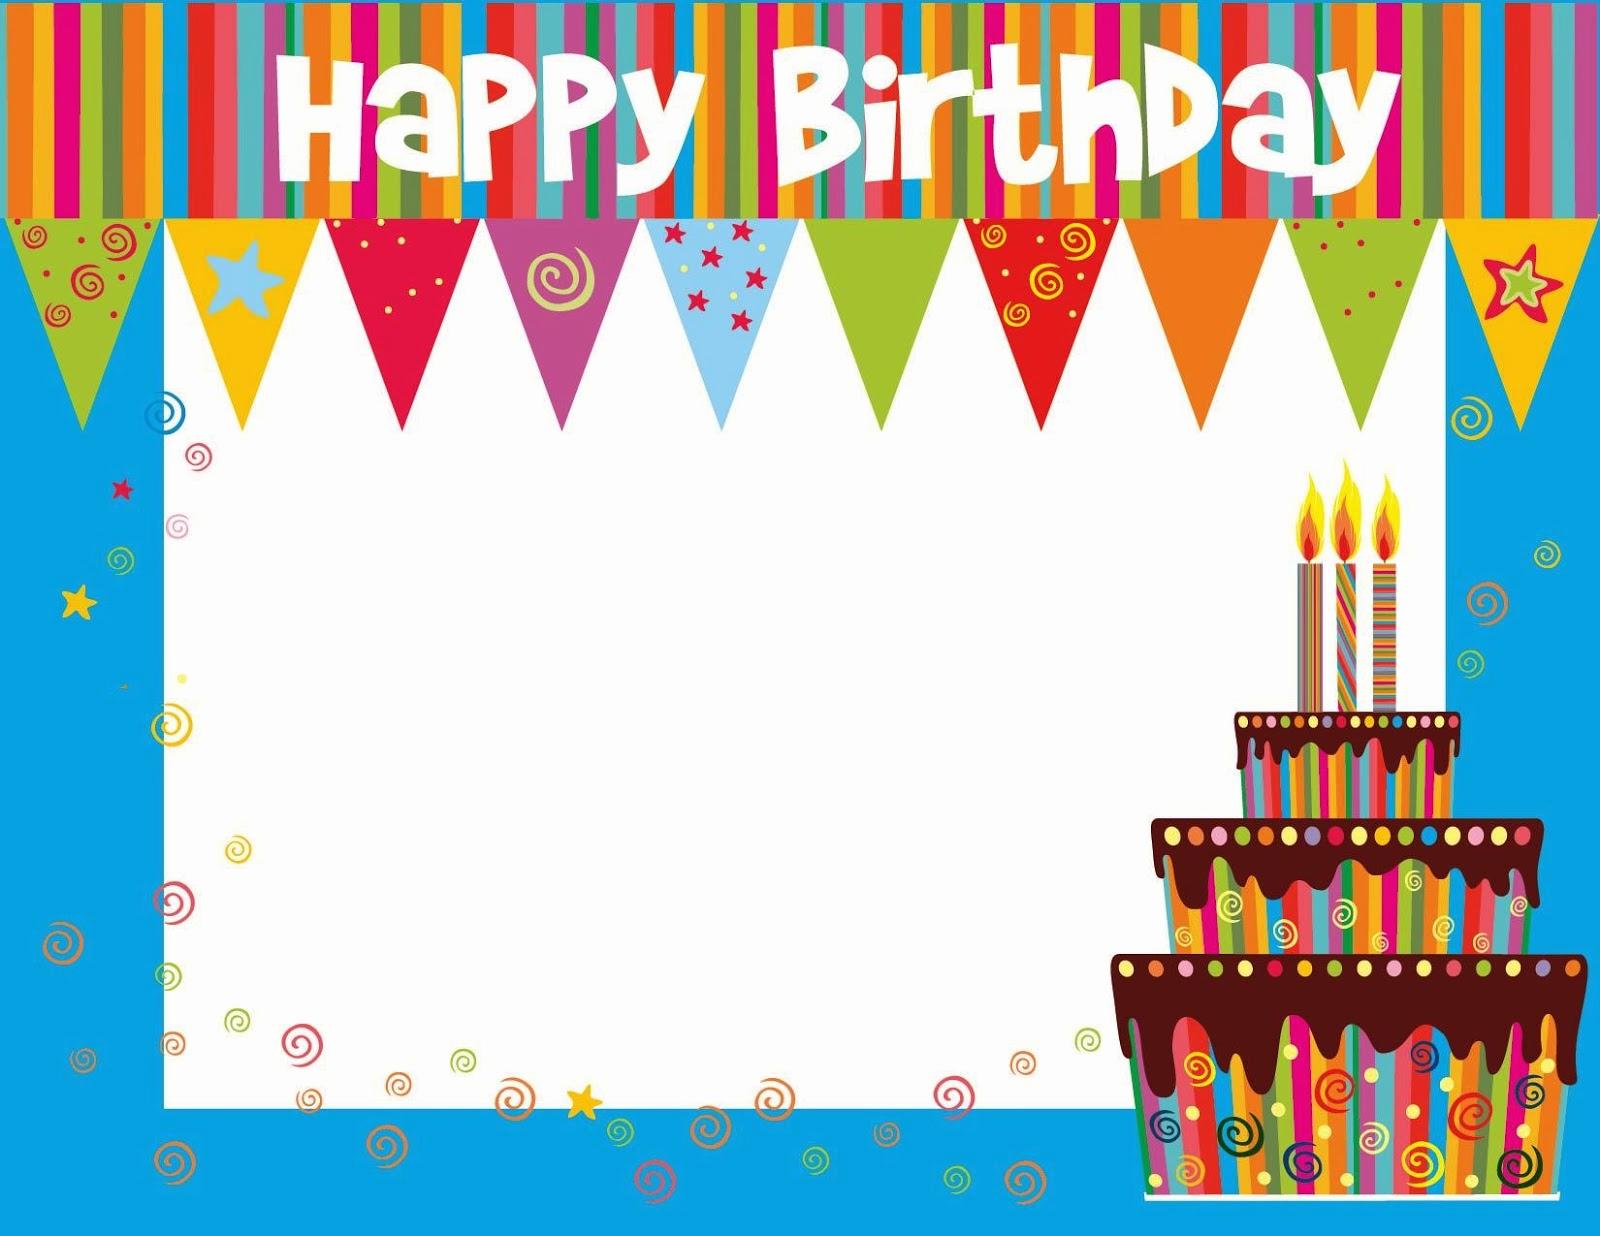 Printable Greeting Card Templates Elegant Free Printable Birthday Cards Ideas Greeting Card Template